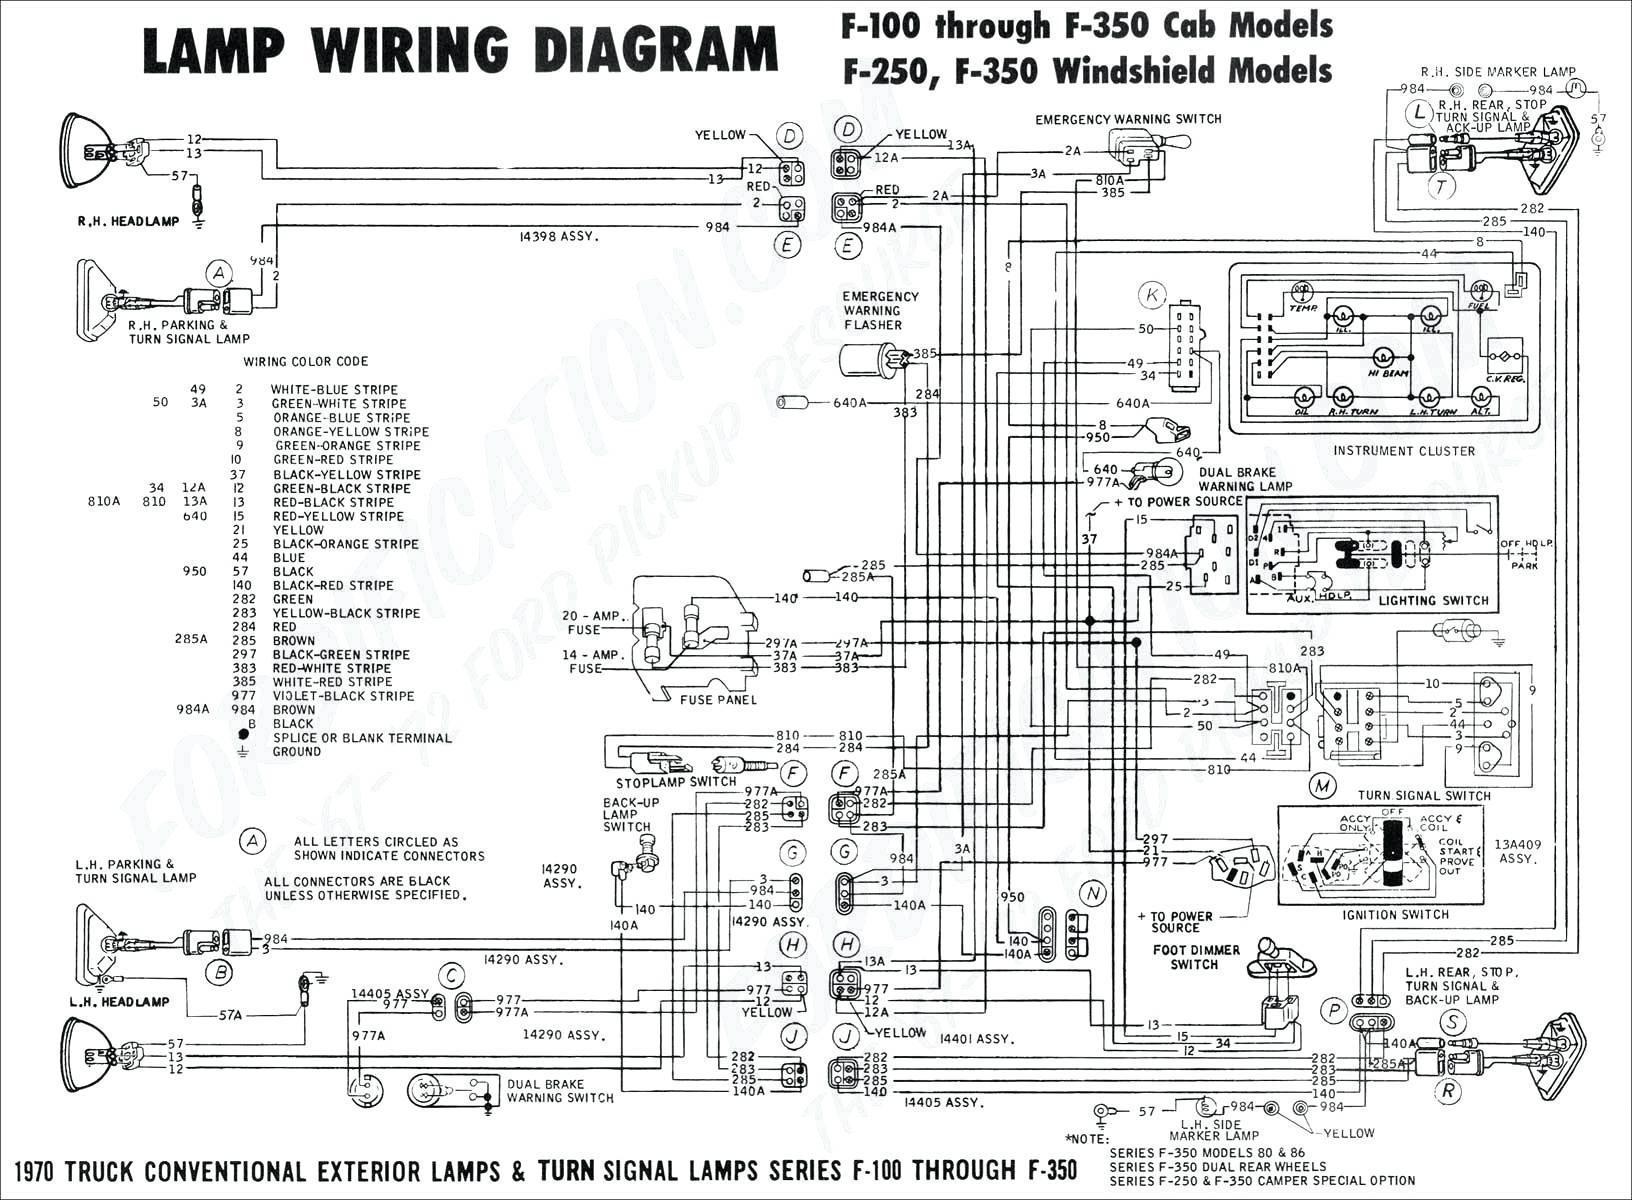 1954 gm headlight switch wiring diagram